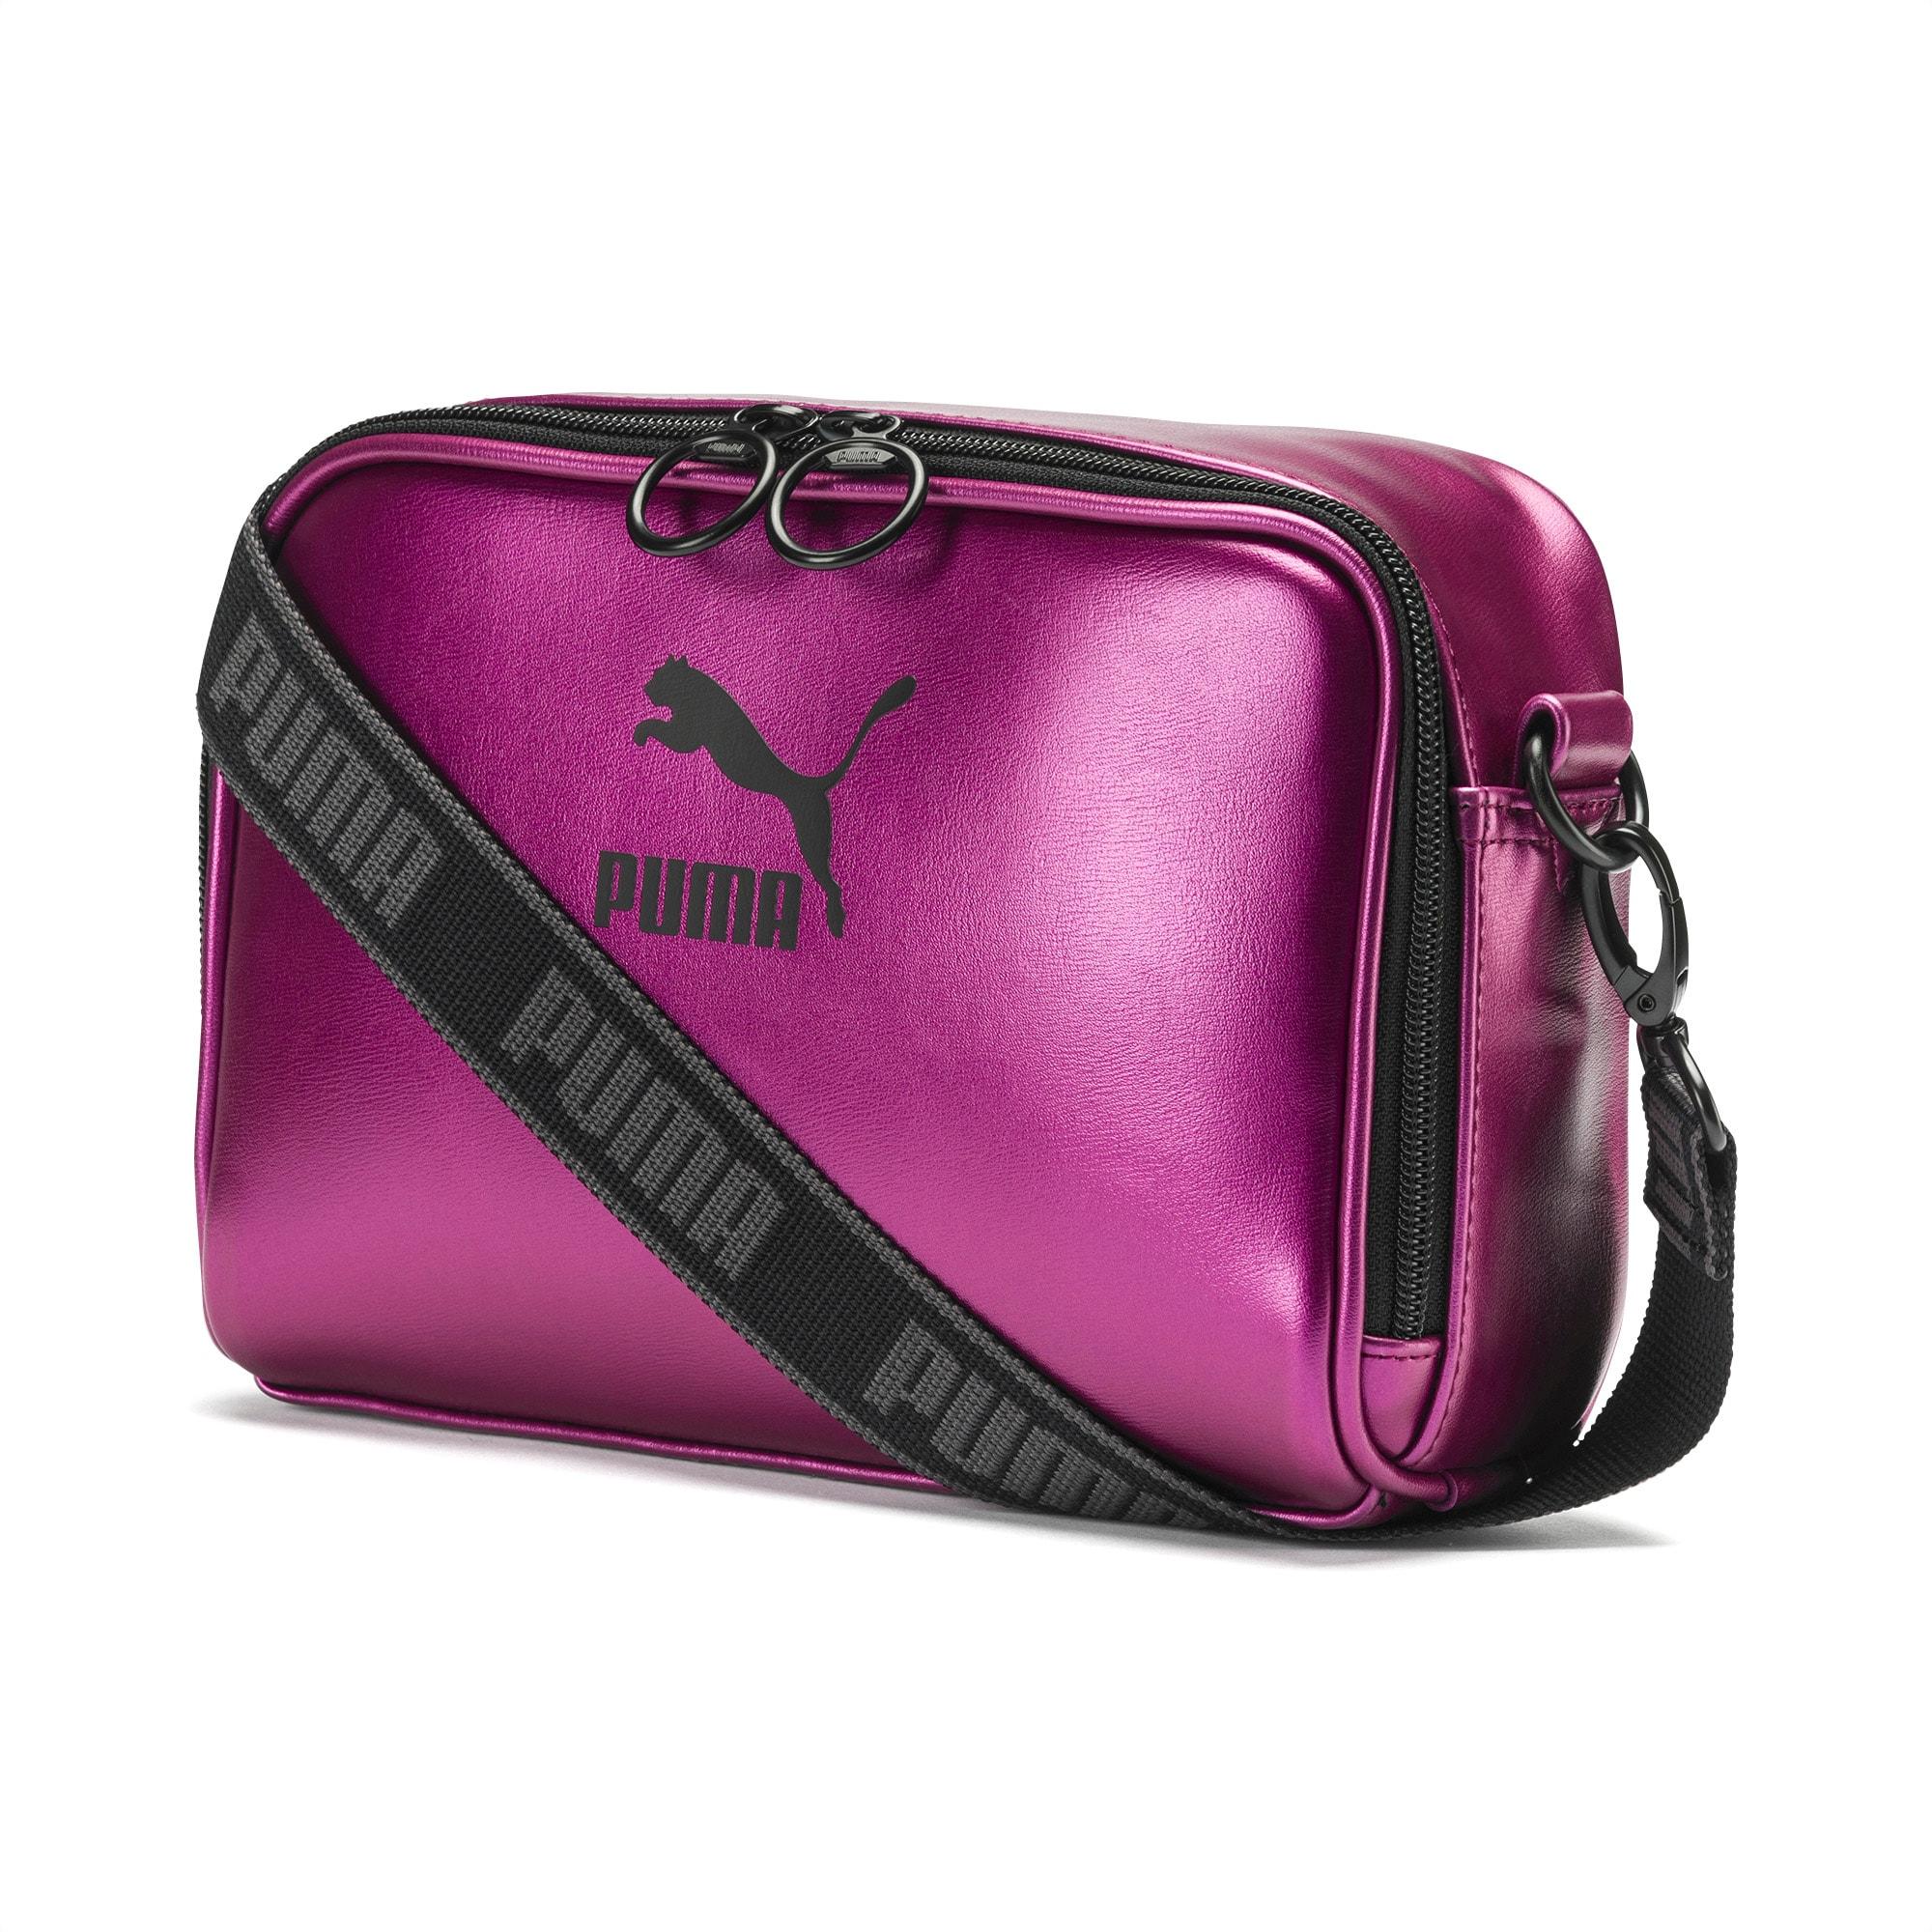 Prime Small Women's Shoulder Bag